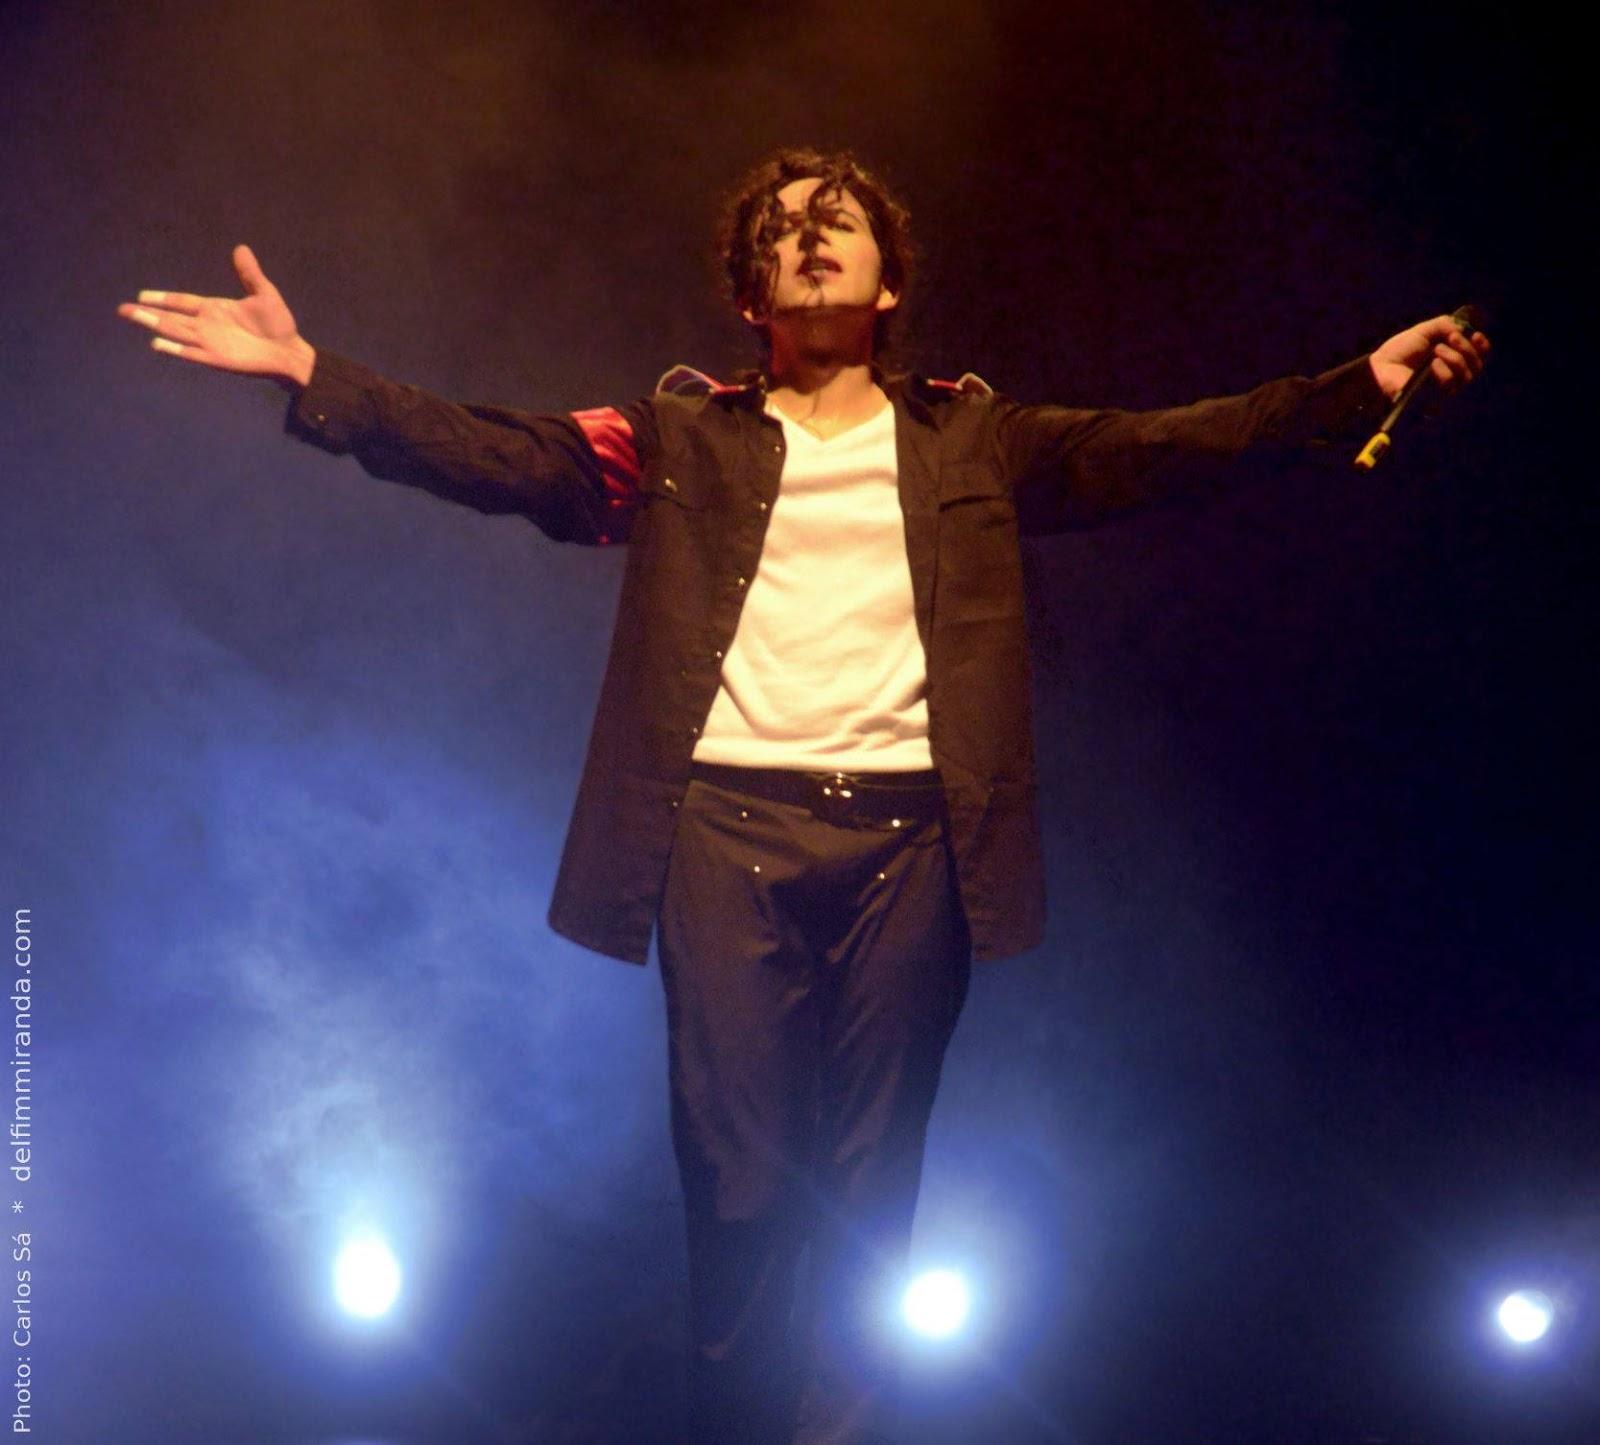 Delfim Miranda - Michael Jackson Tribute - Man in the Mirror - Live on Stage